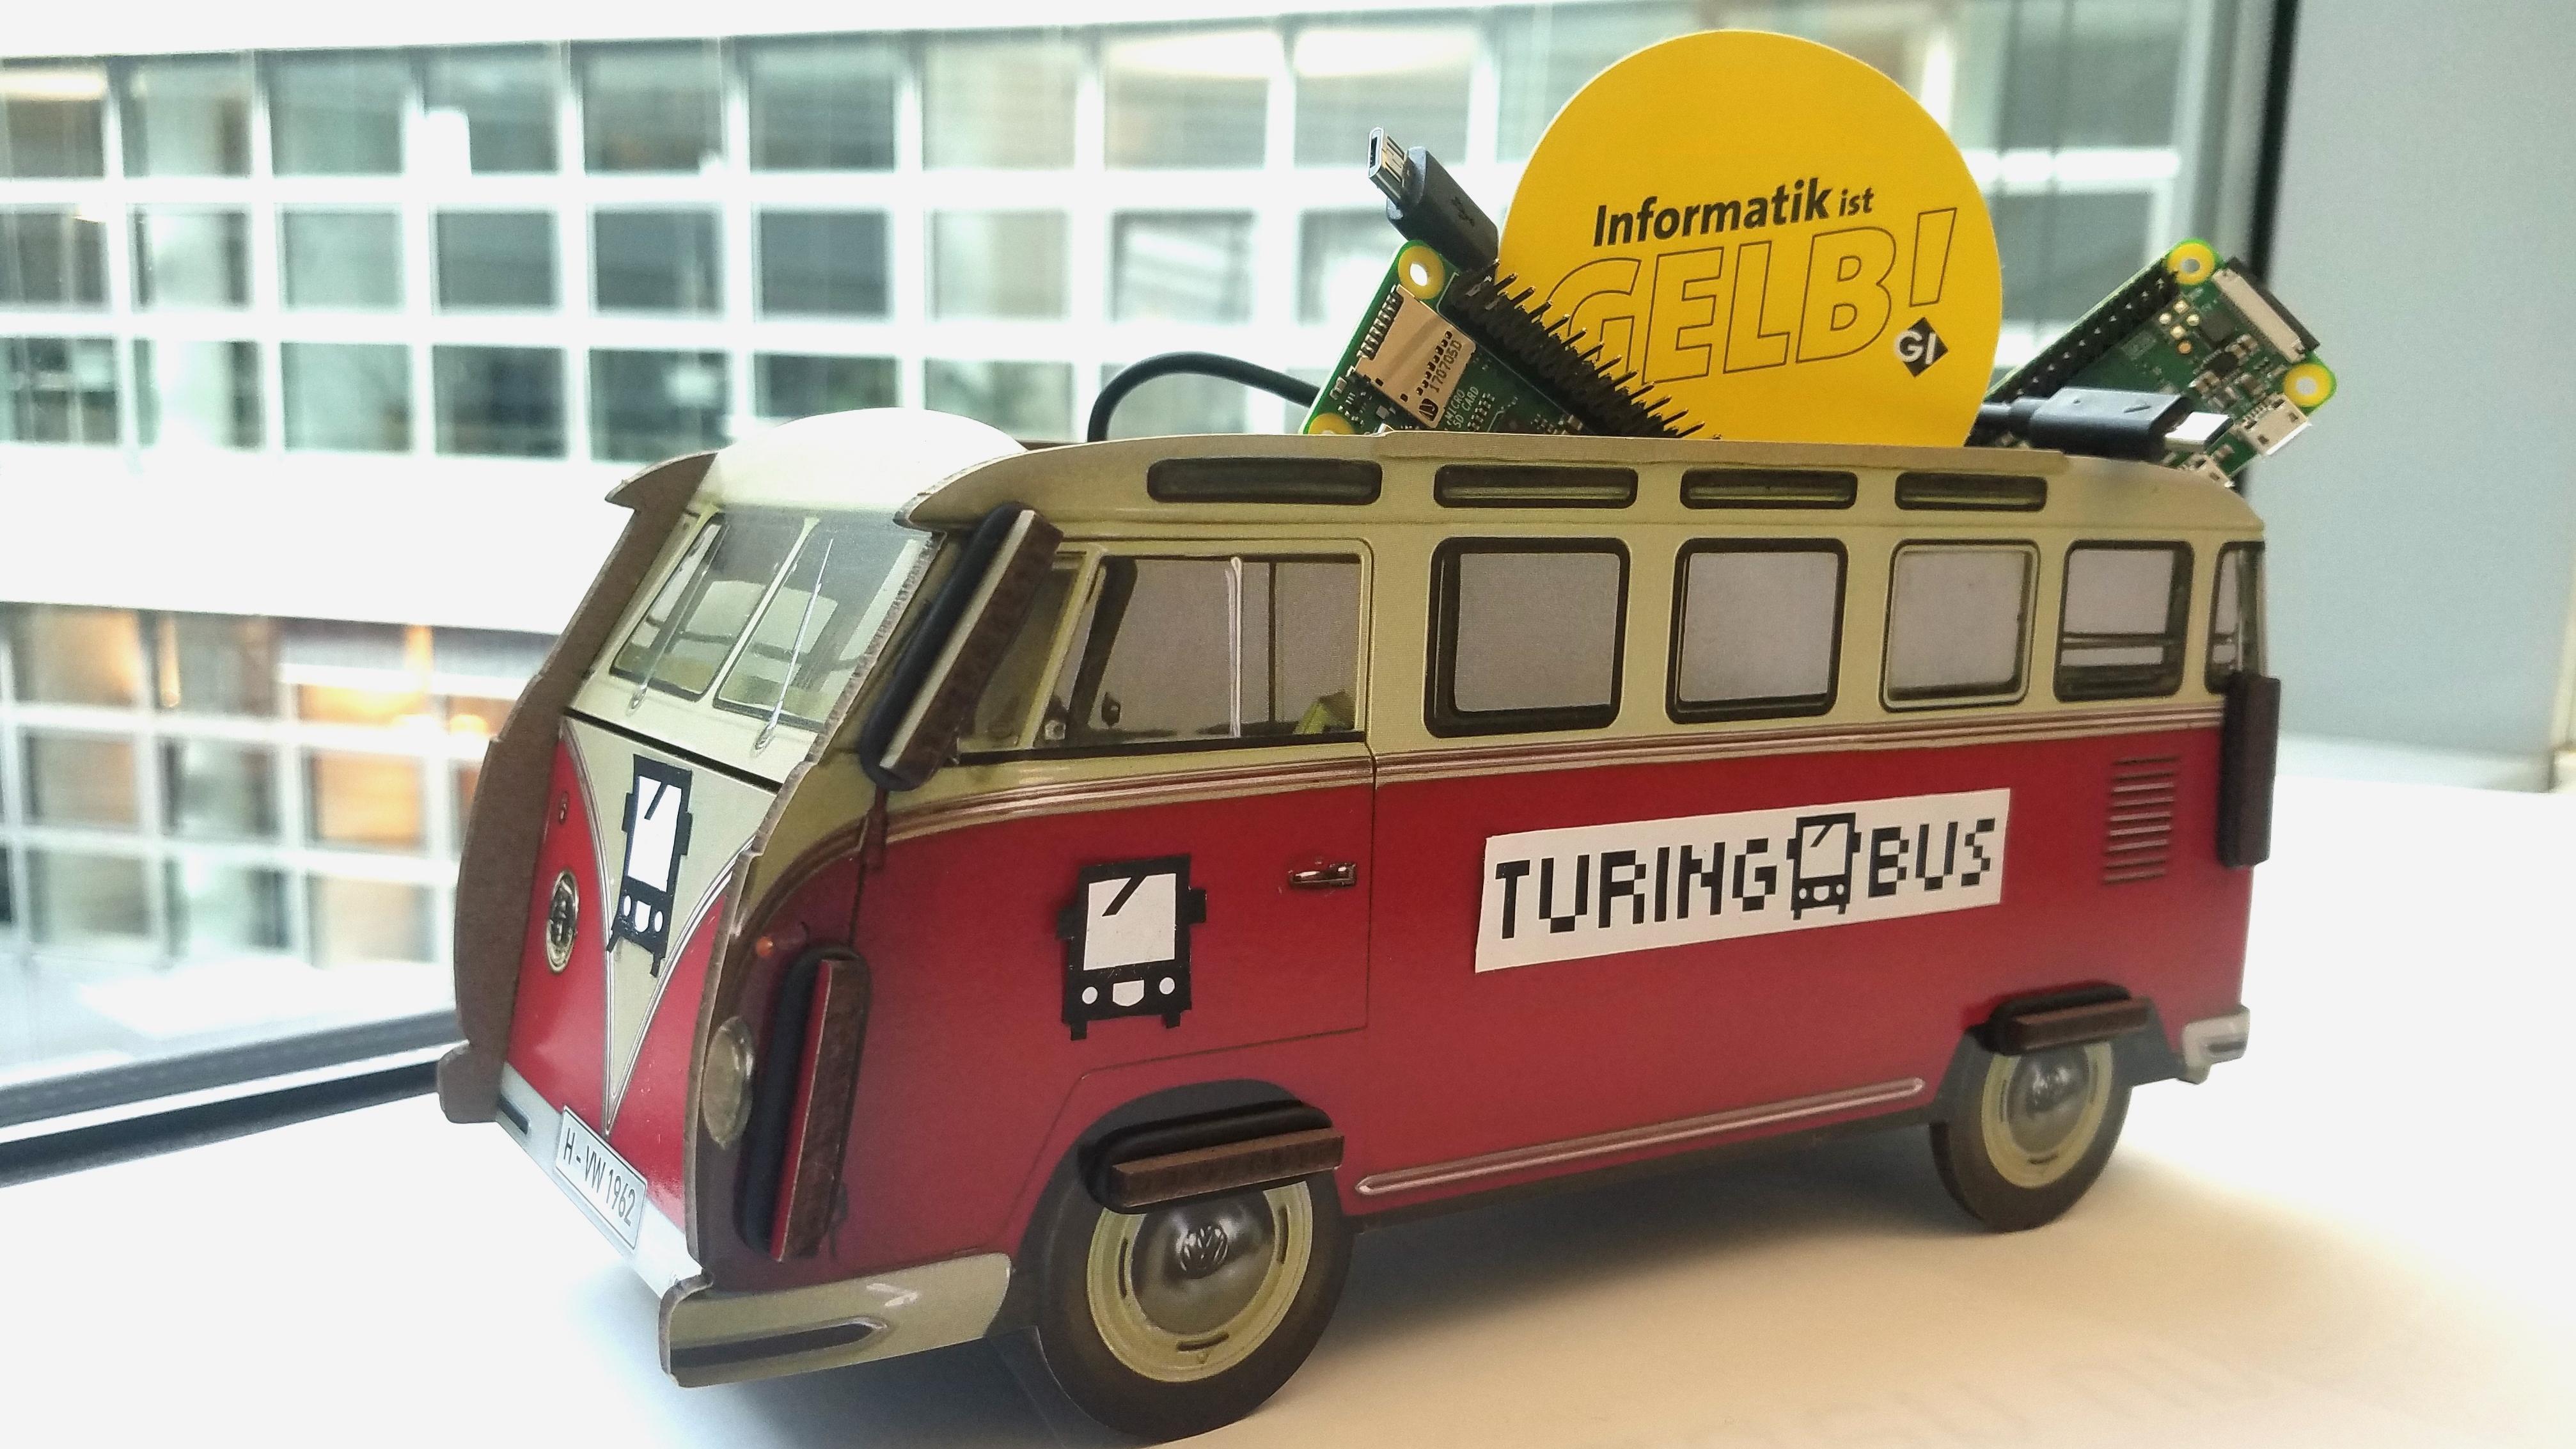 Turing Bus